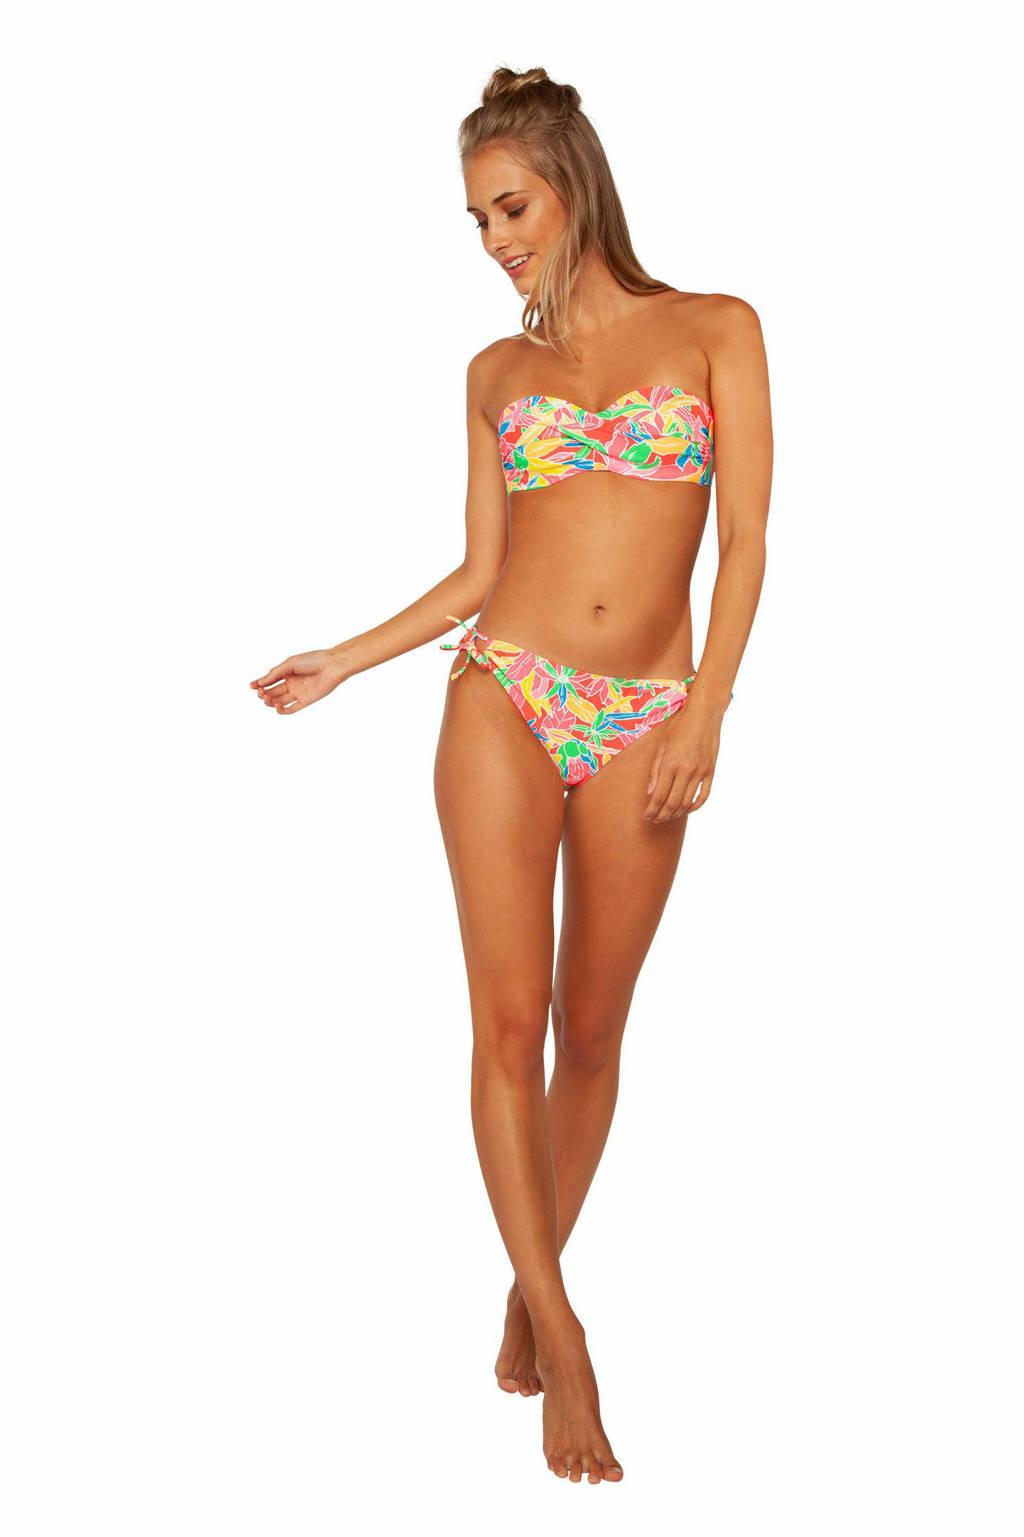 Protest strapless bandeau bikini Pousada C-cup met all over print roze/groen/geel, Parakeet